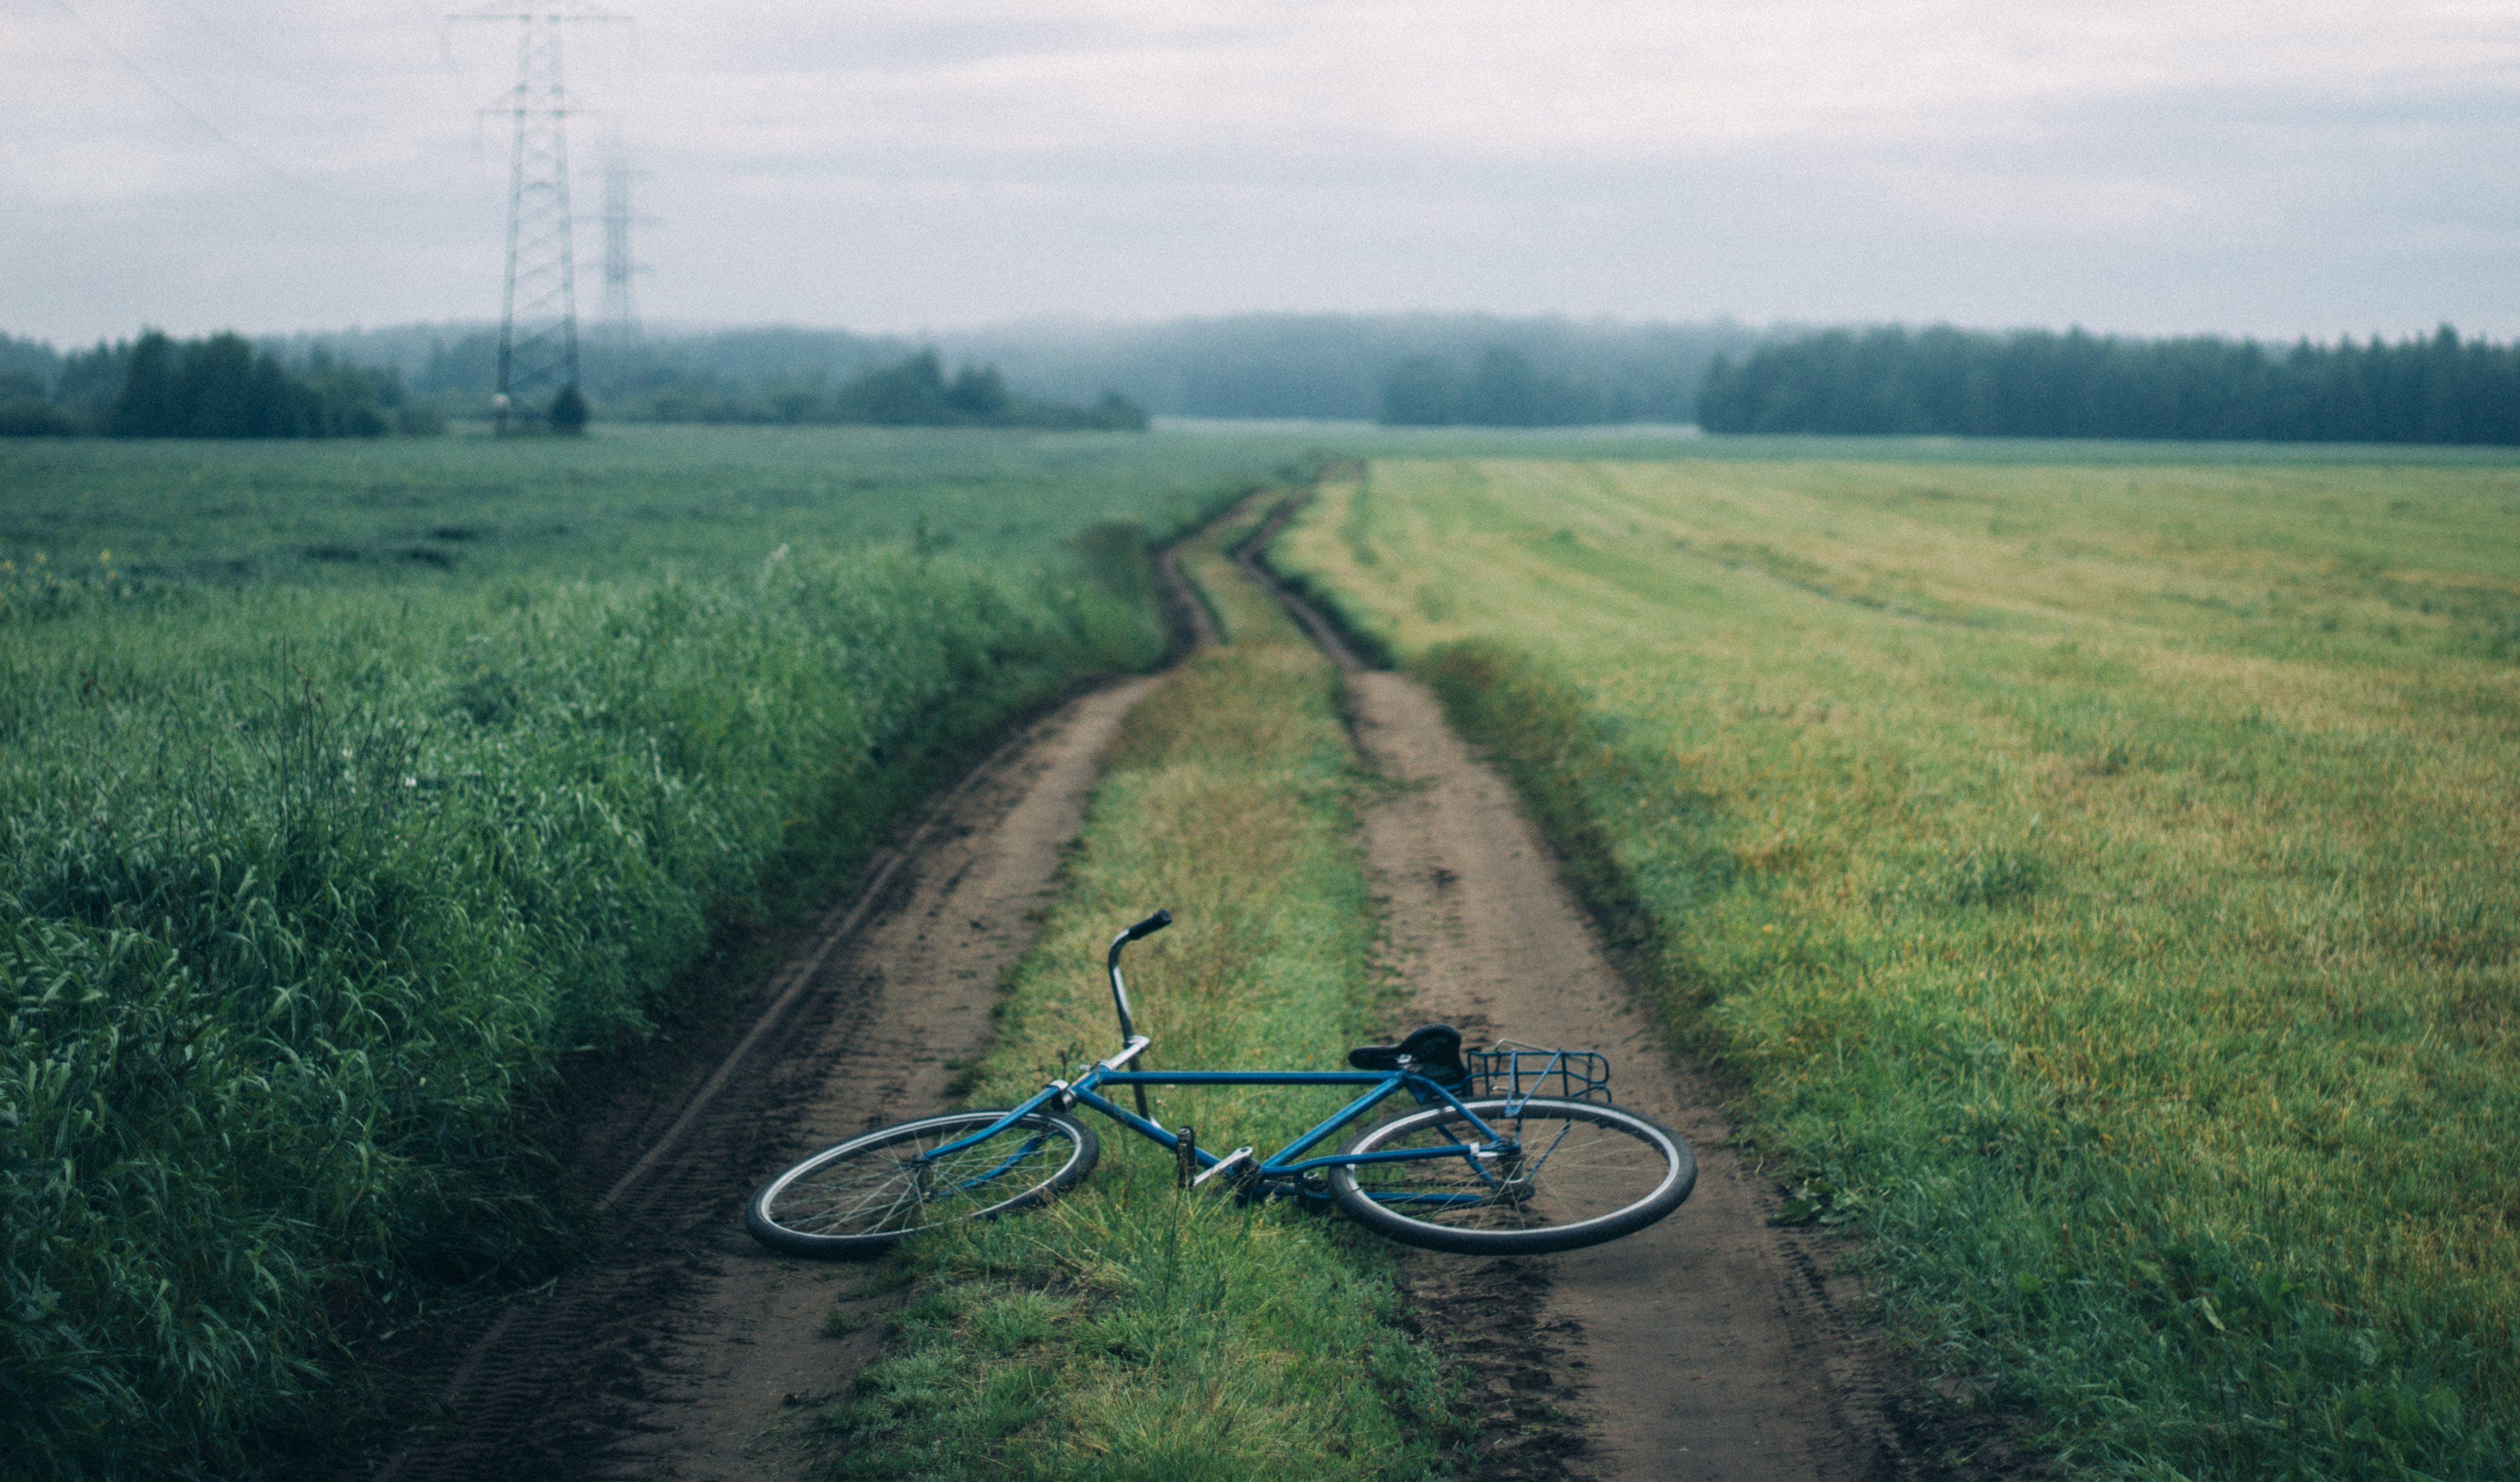 Landscape Photography of Blue Commuter Bike on Green Grass